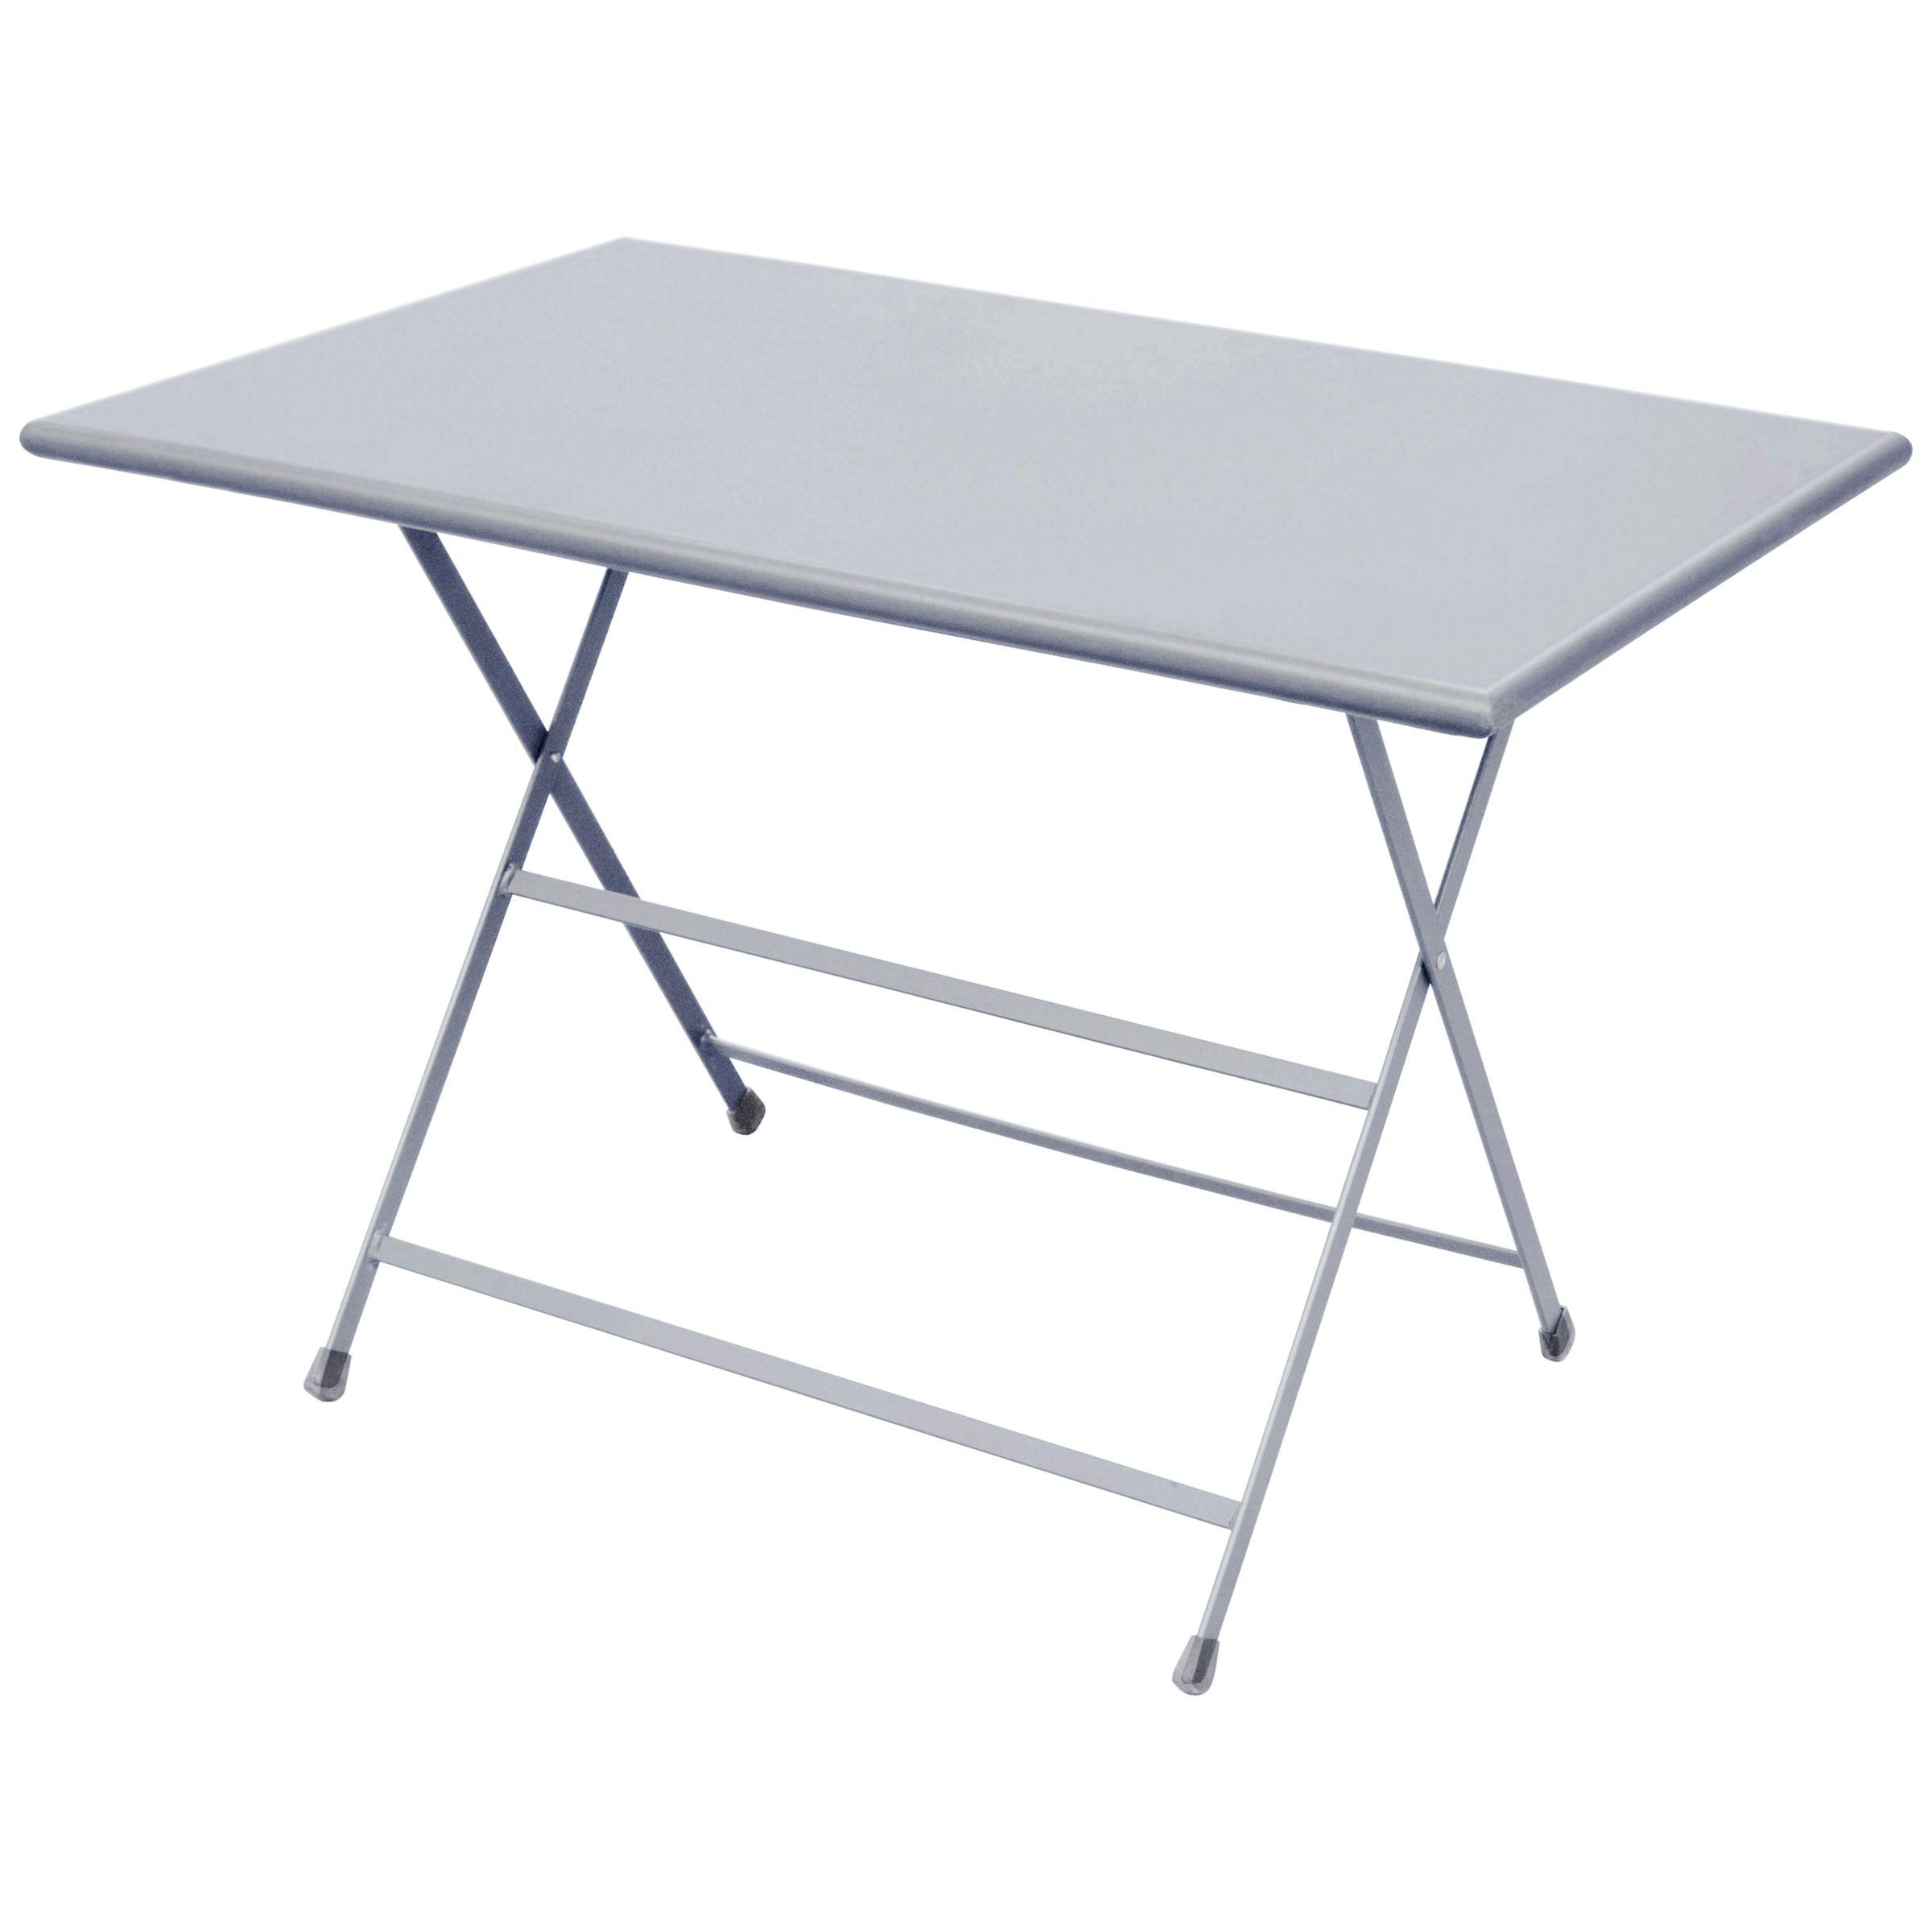 EMU Arc En Ciel Rectangular 4 Seater Outdoor Dining Table, Aluminium